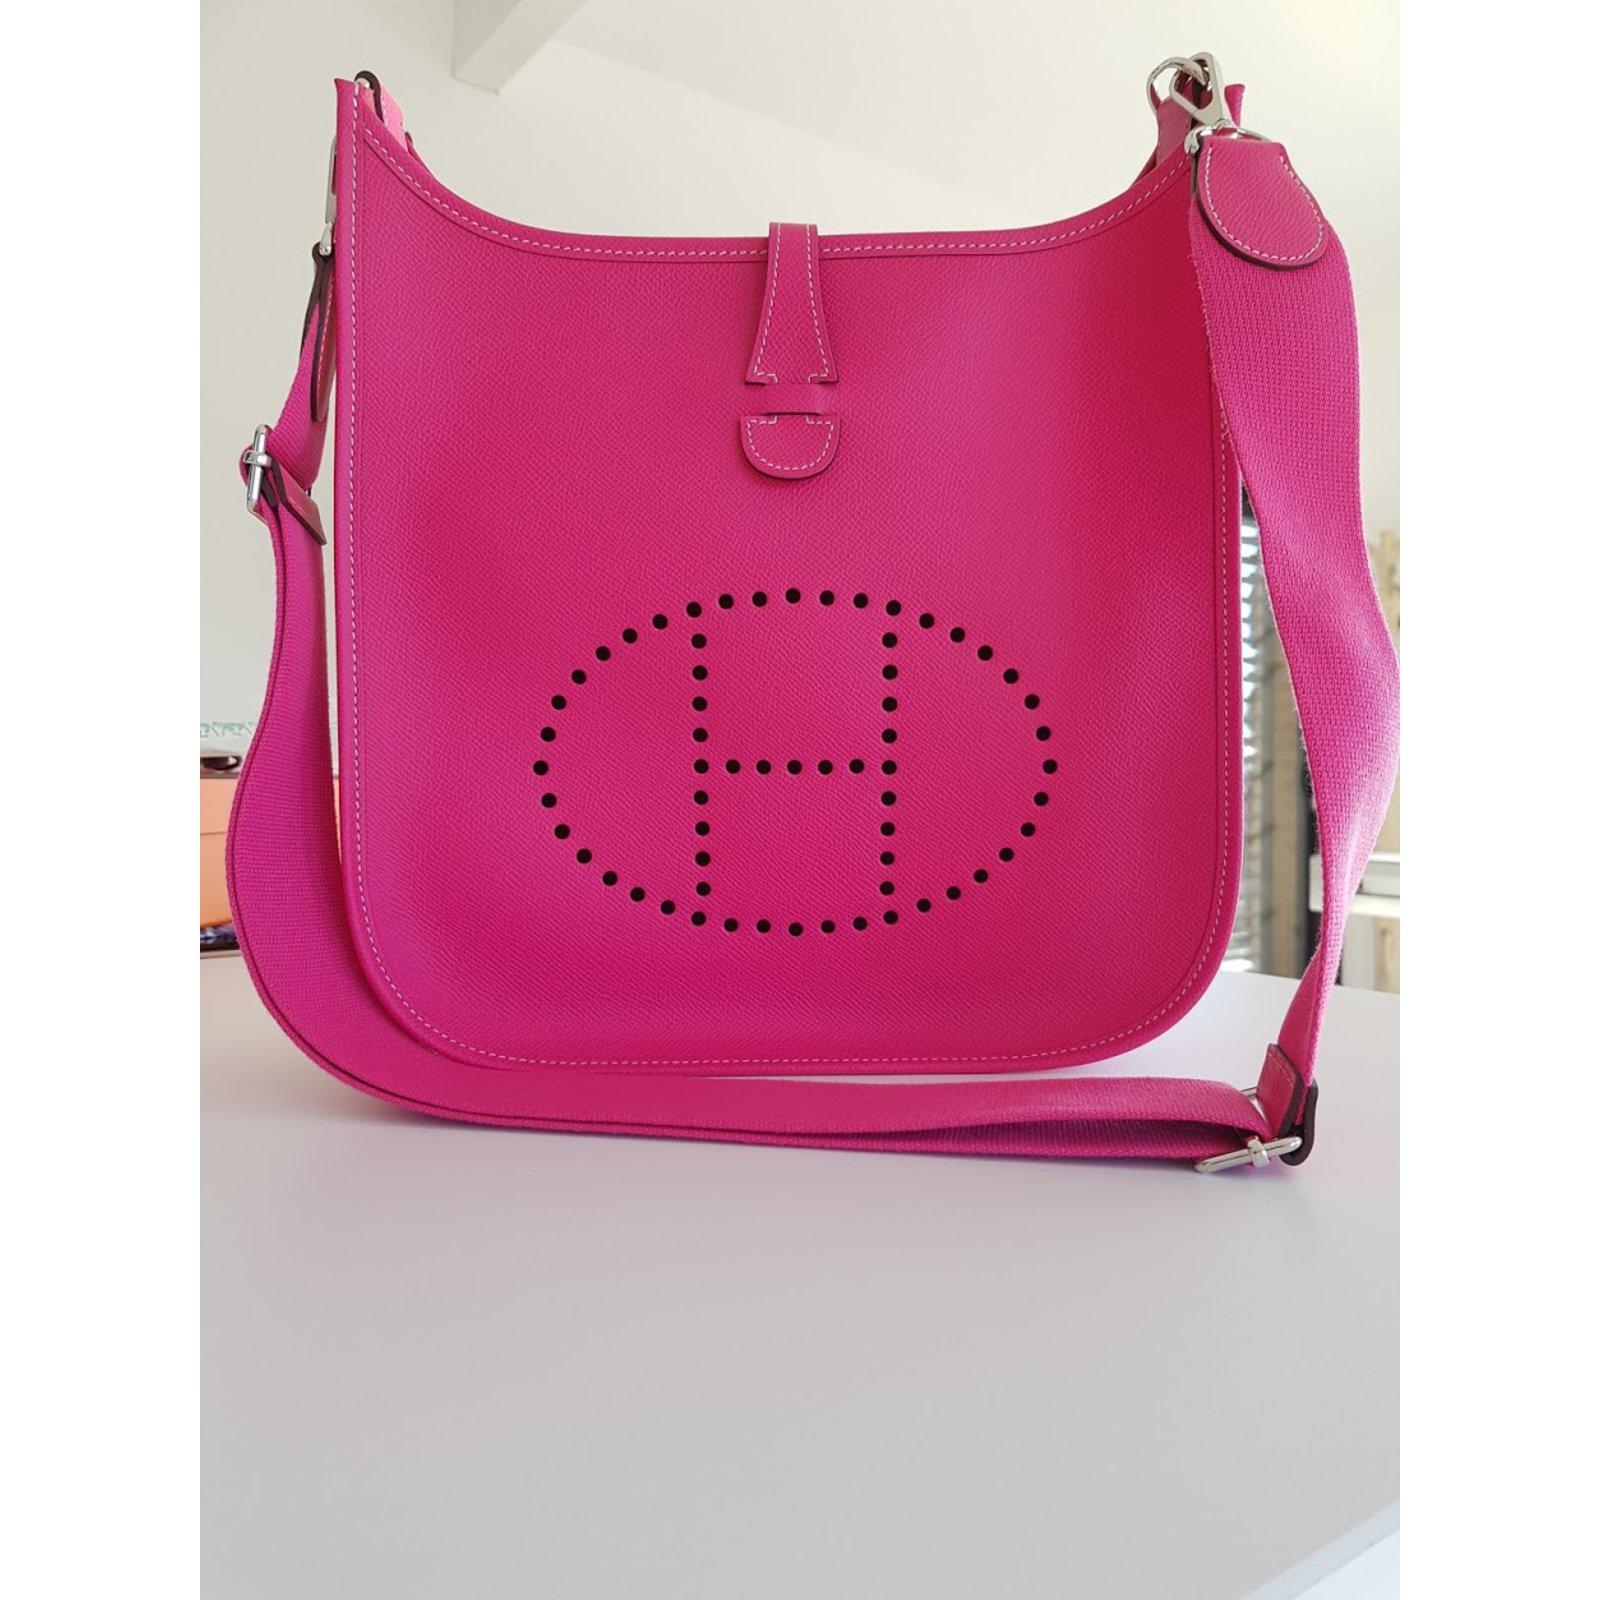 53decf704aa0 Hermès EVELYNE III 29 Handbags Leather Pink ref.61796 - Joli Closet